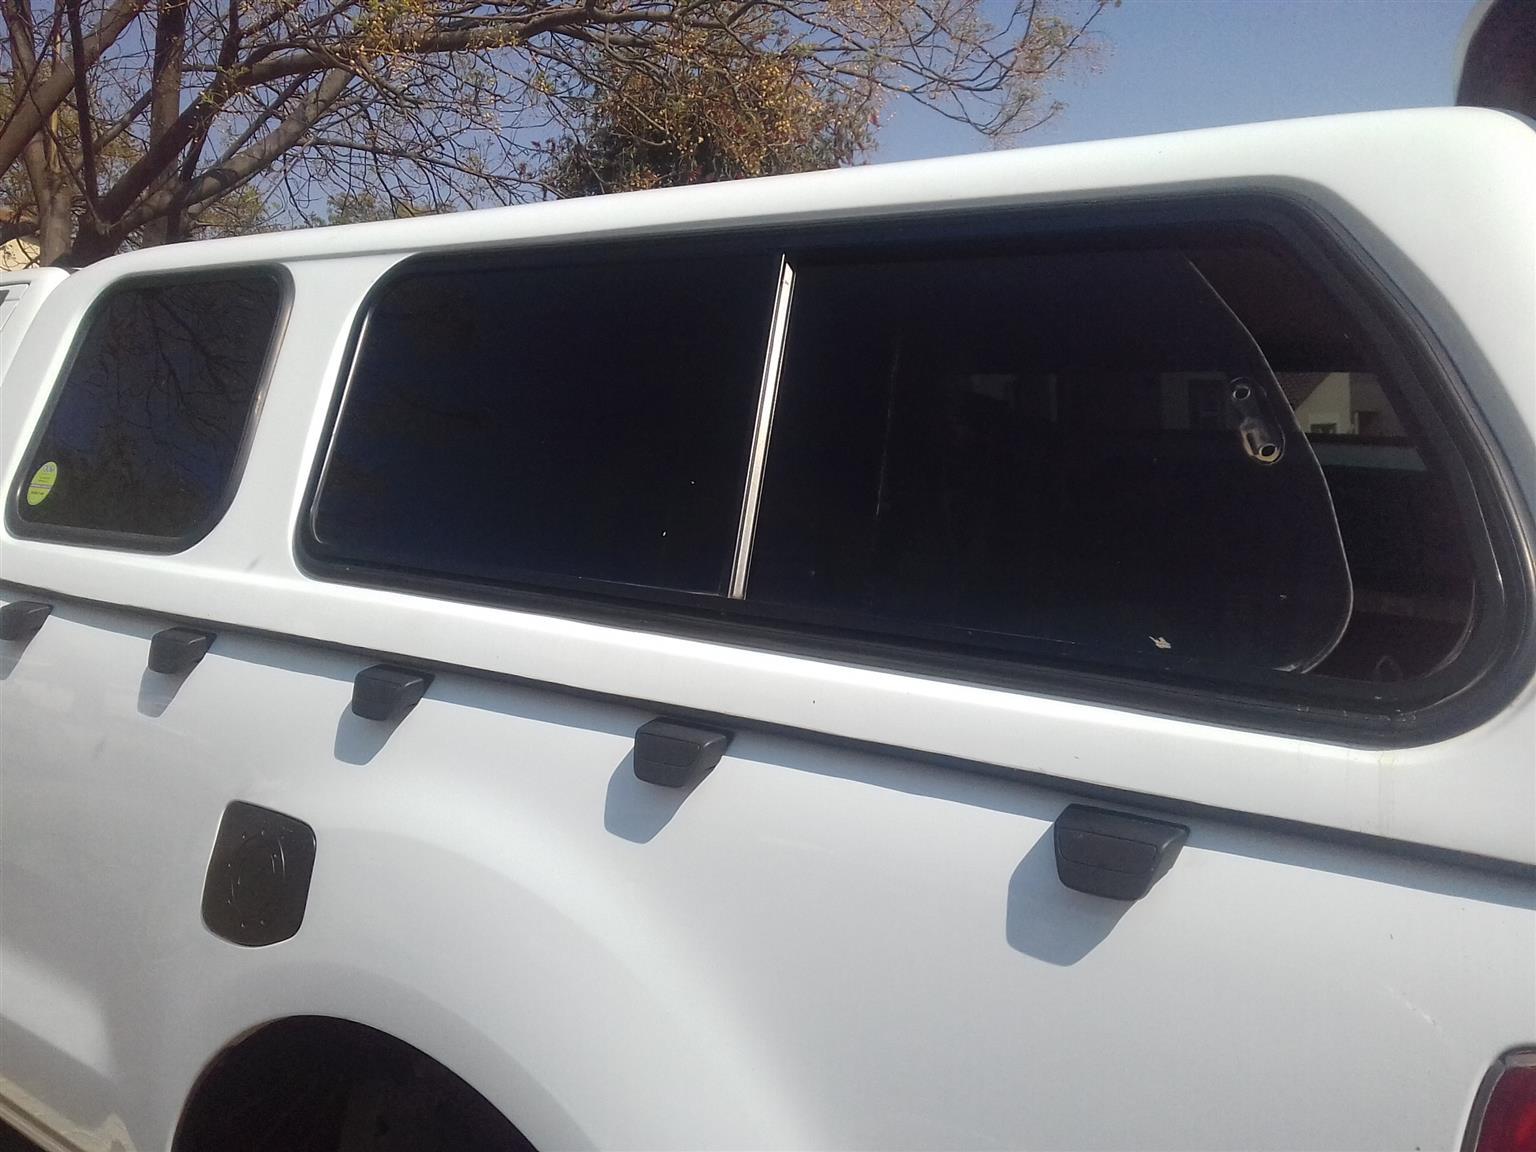 December specials on all solar safety window film supply & installations